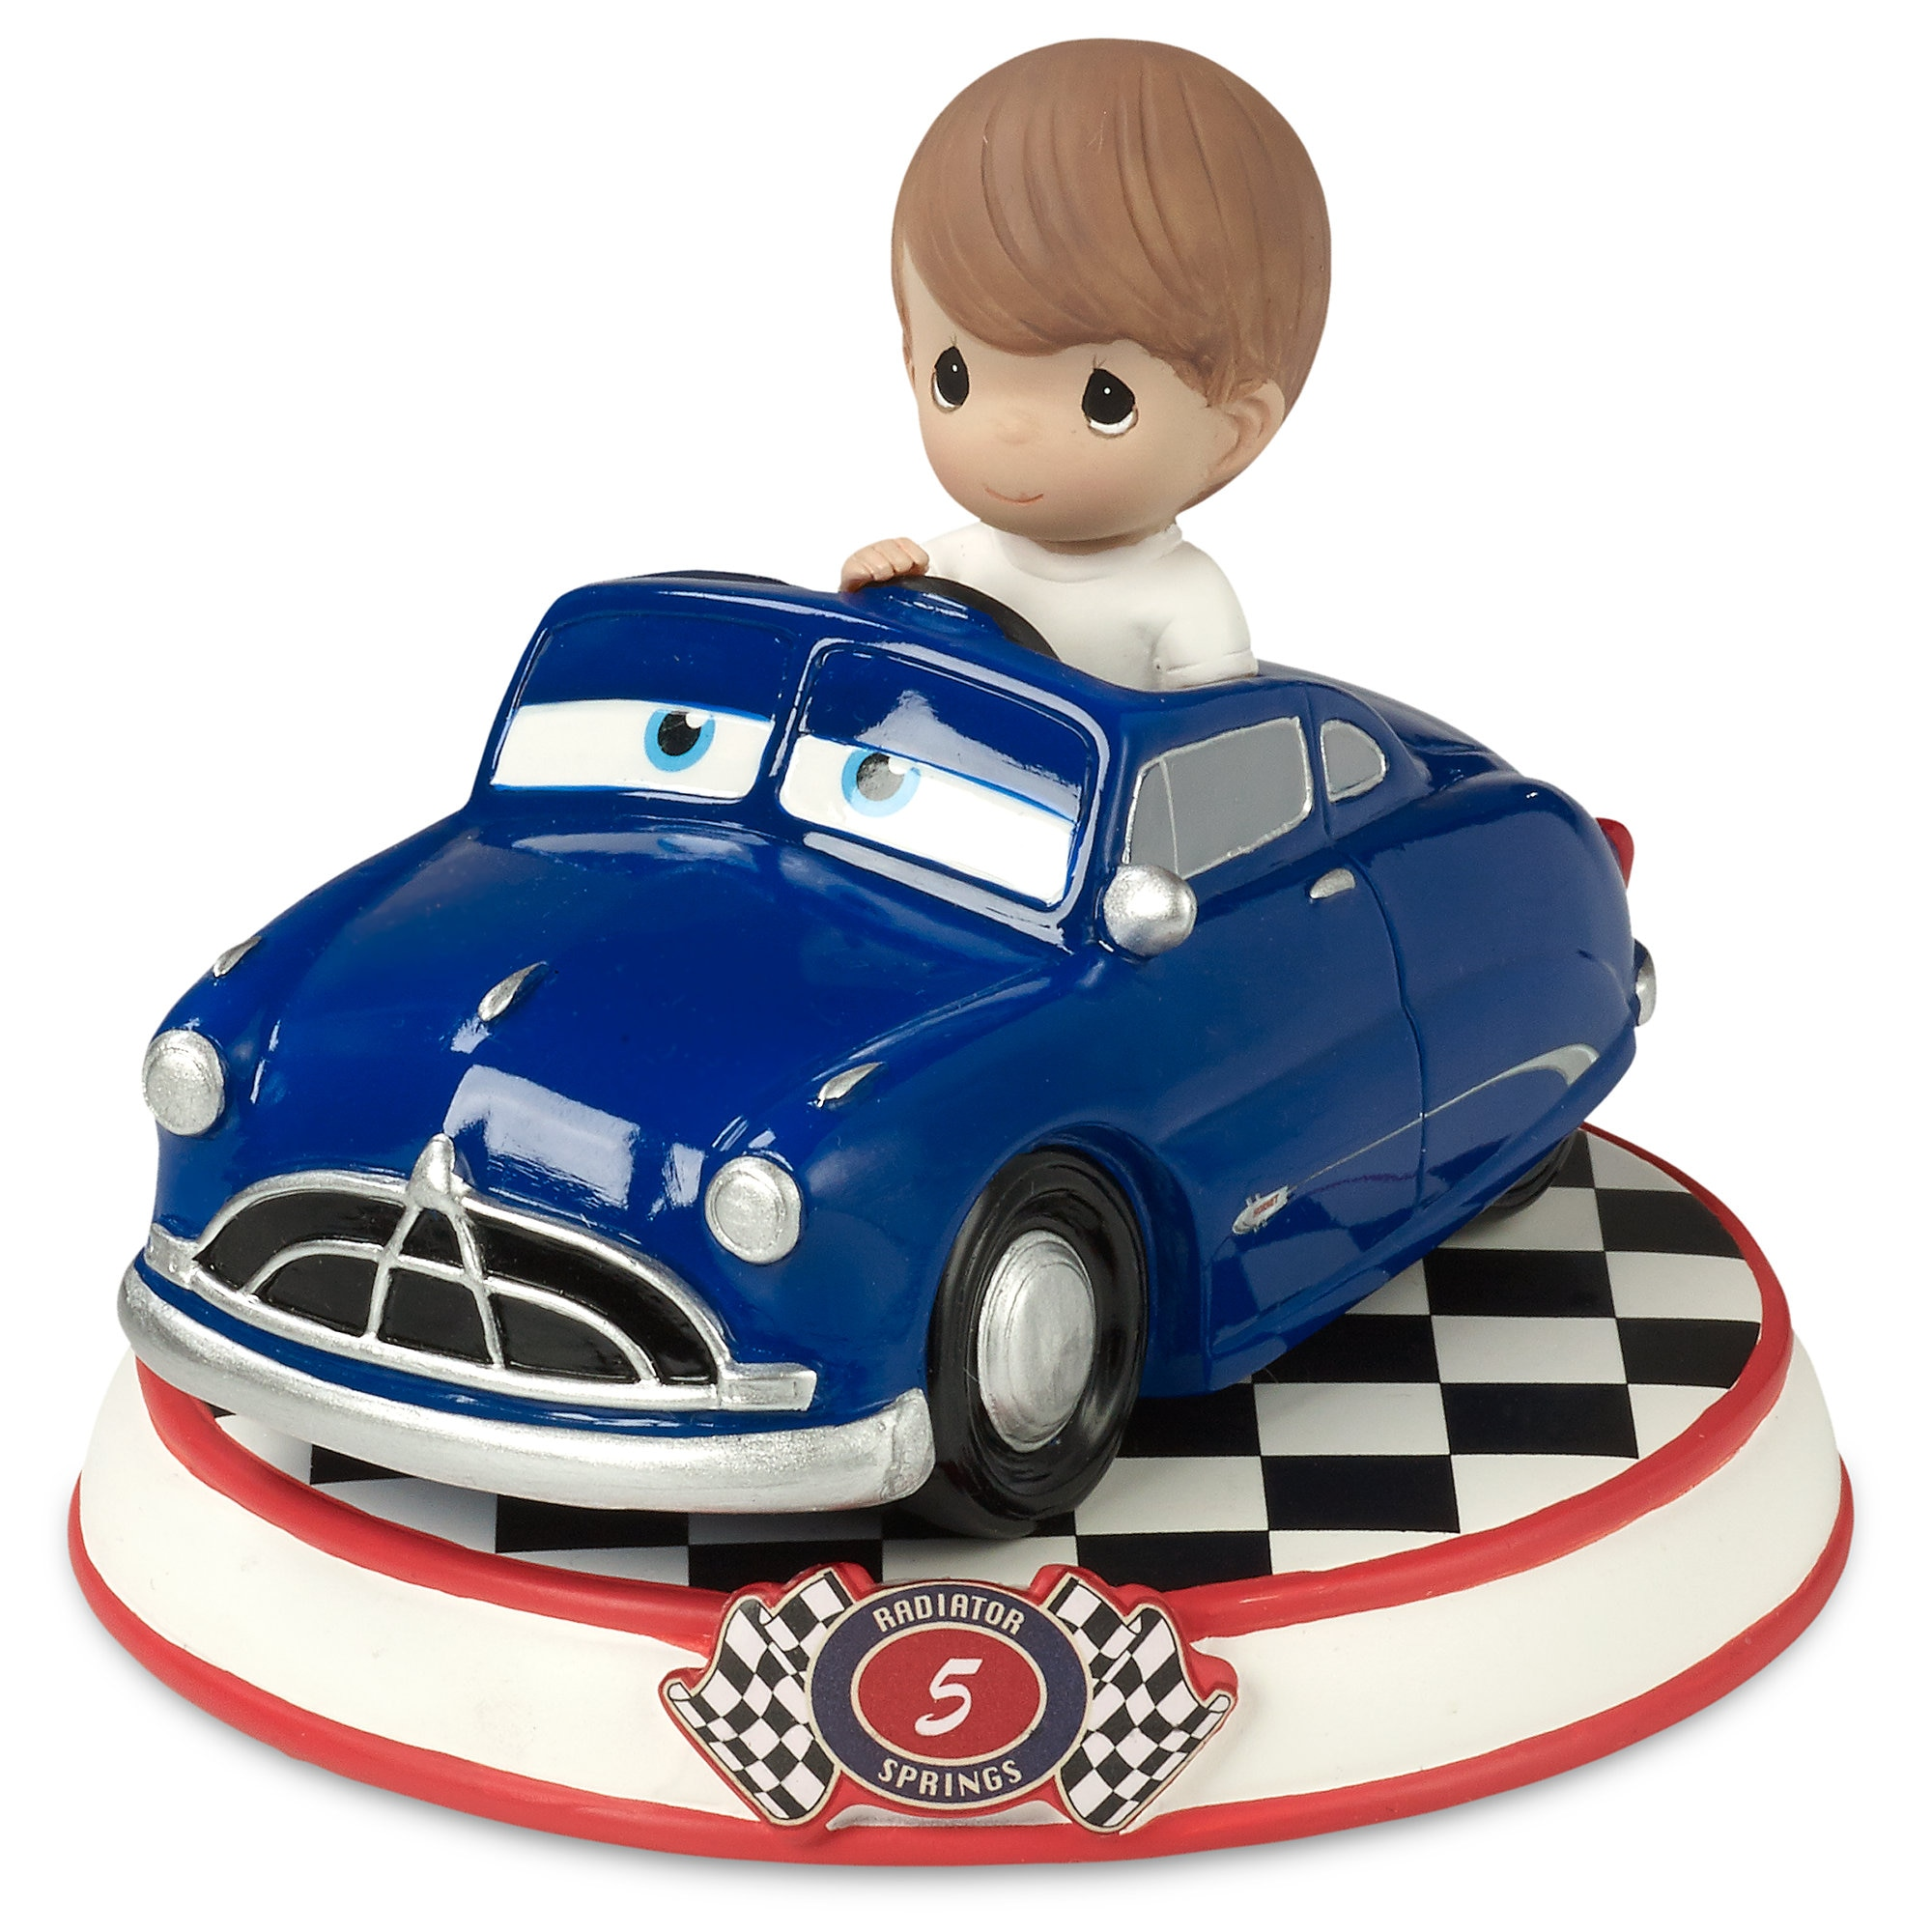 Doc Hudson Figurine by Precious Moments - Cars